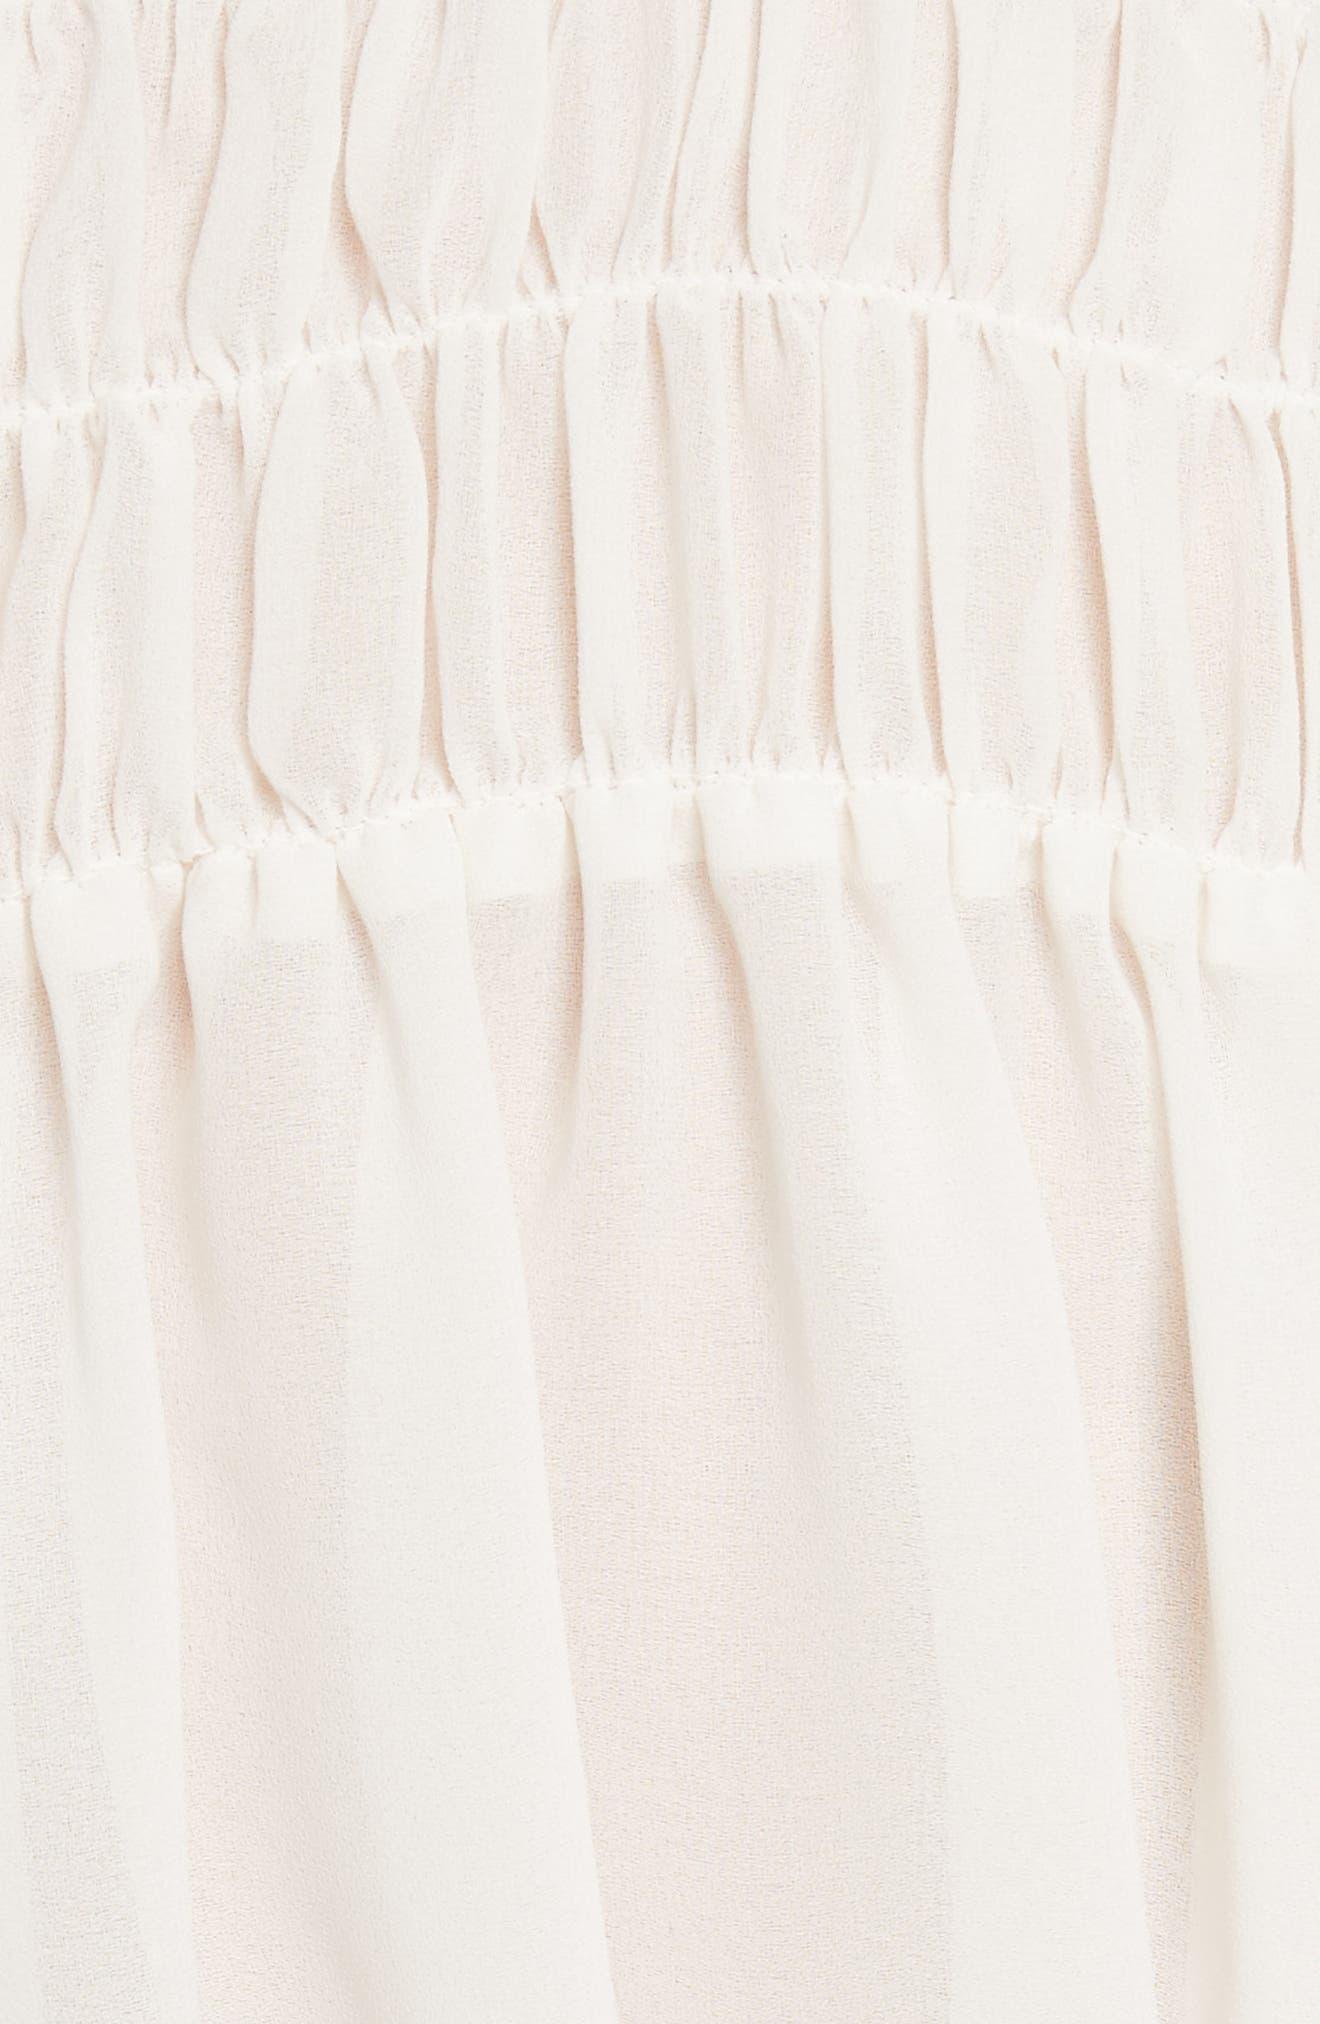 Smocked Tie Back Blouse,                             Alternate thumbnail 6, color,                             Off White